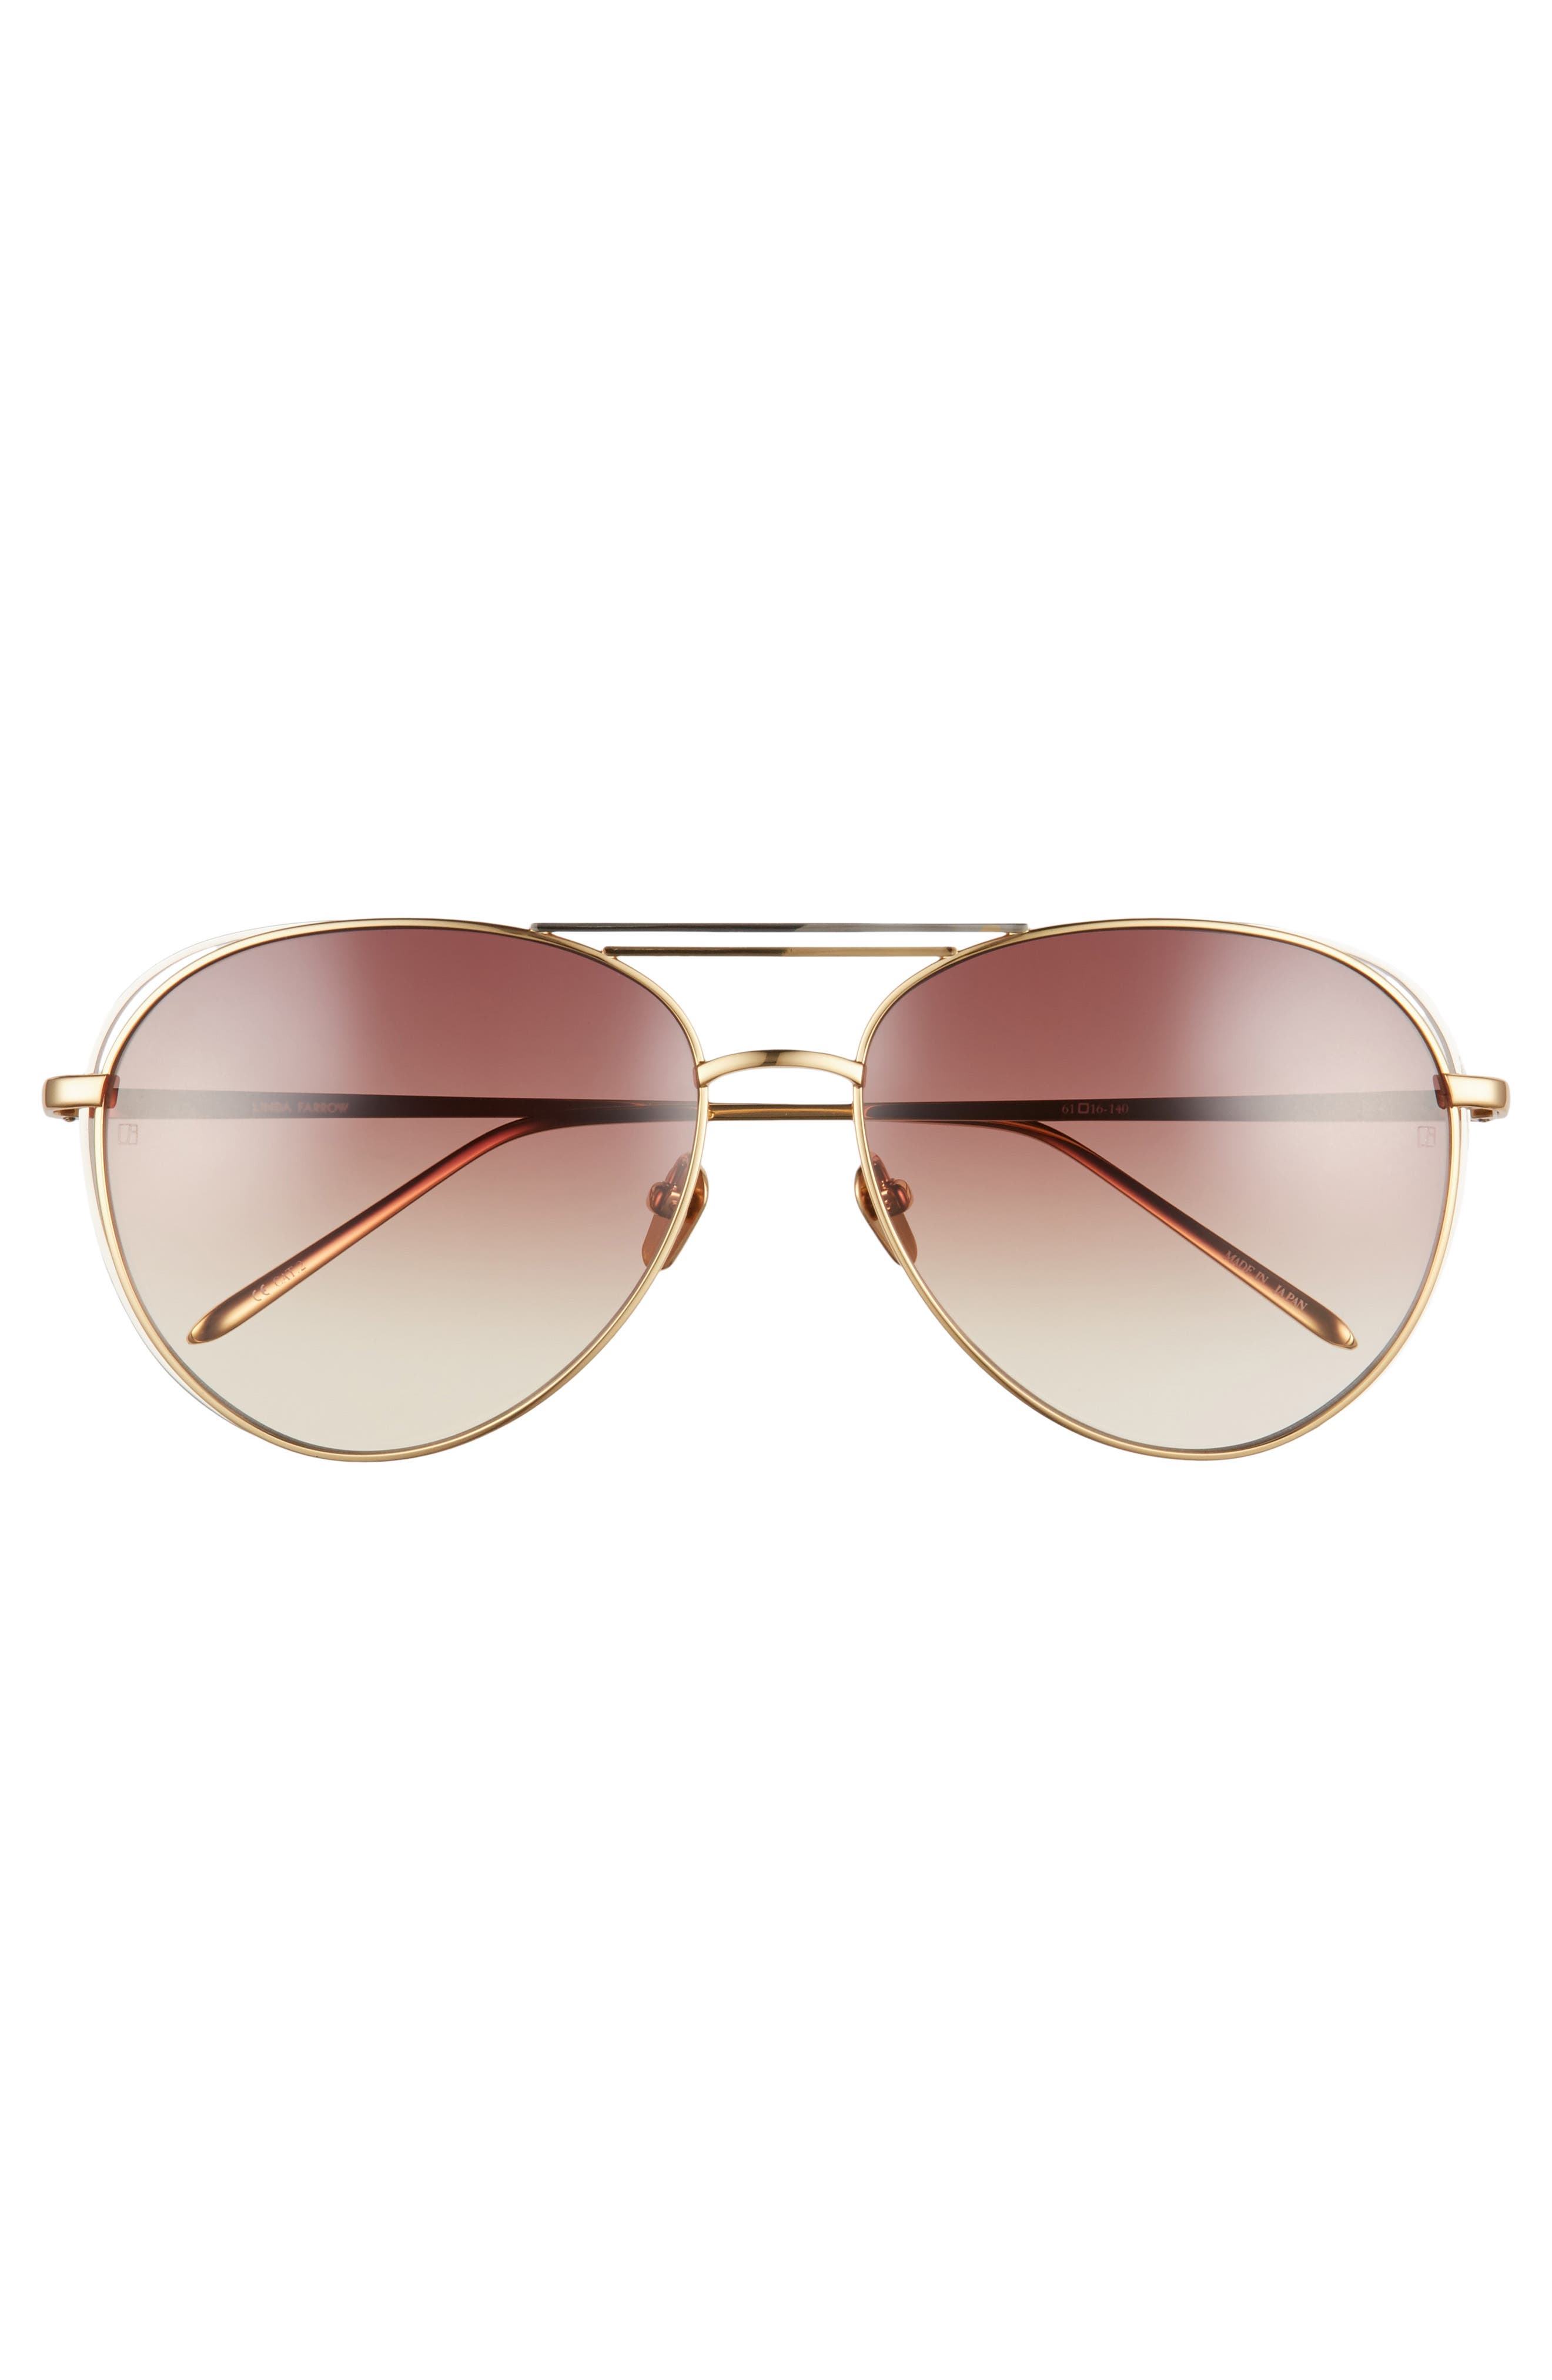 61mm 18 Karat Gold Aviator Sunglasses,                             Alternate thumbnail 8, color,